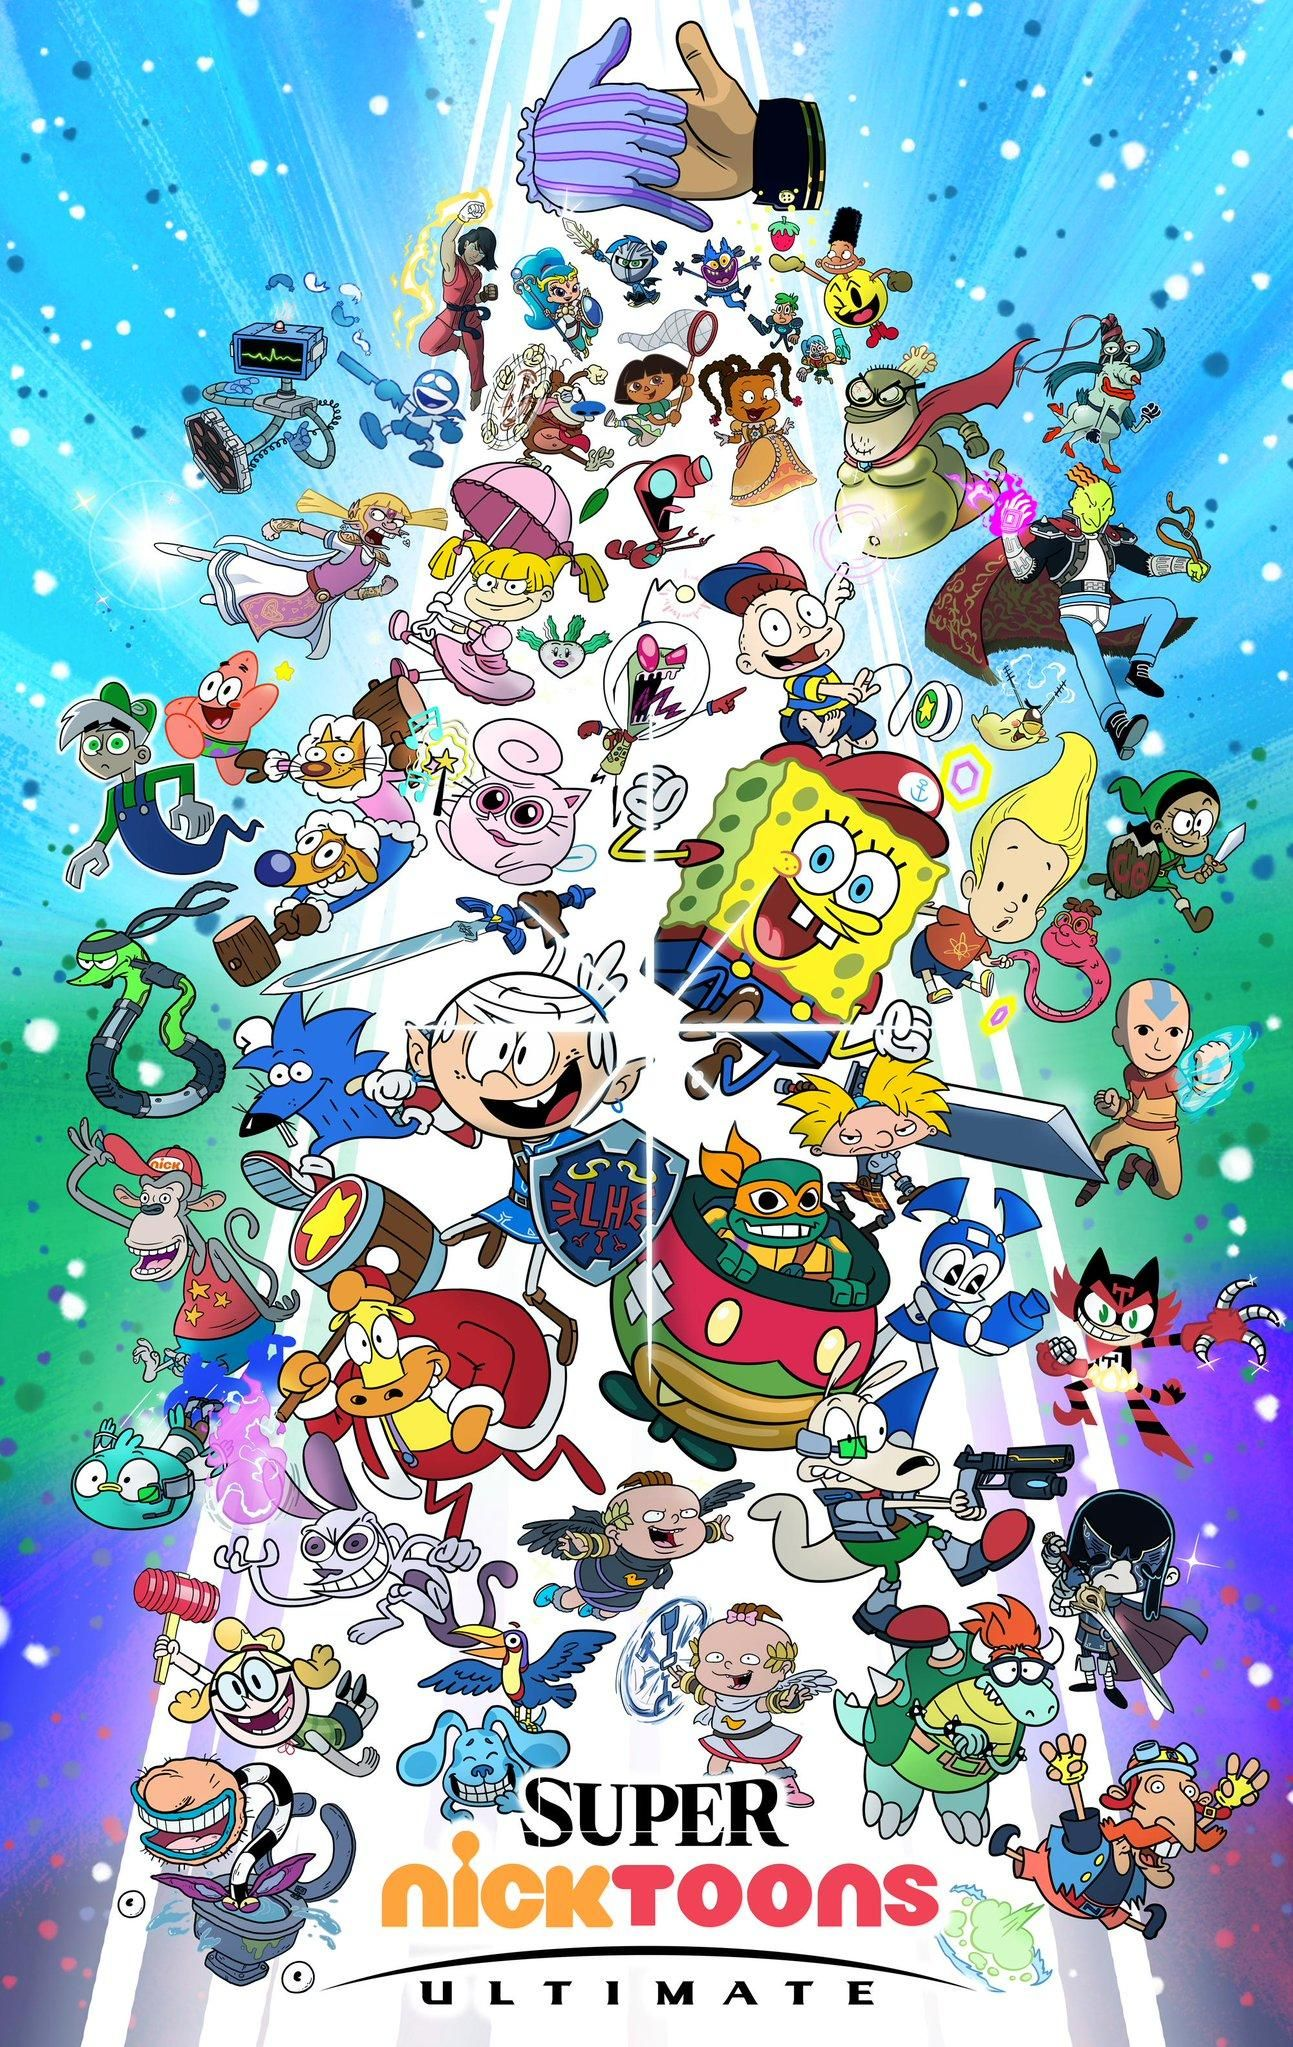 Super Nicktoons Ultimate Cartoon crossovers, Super smash